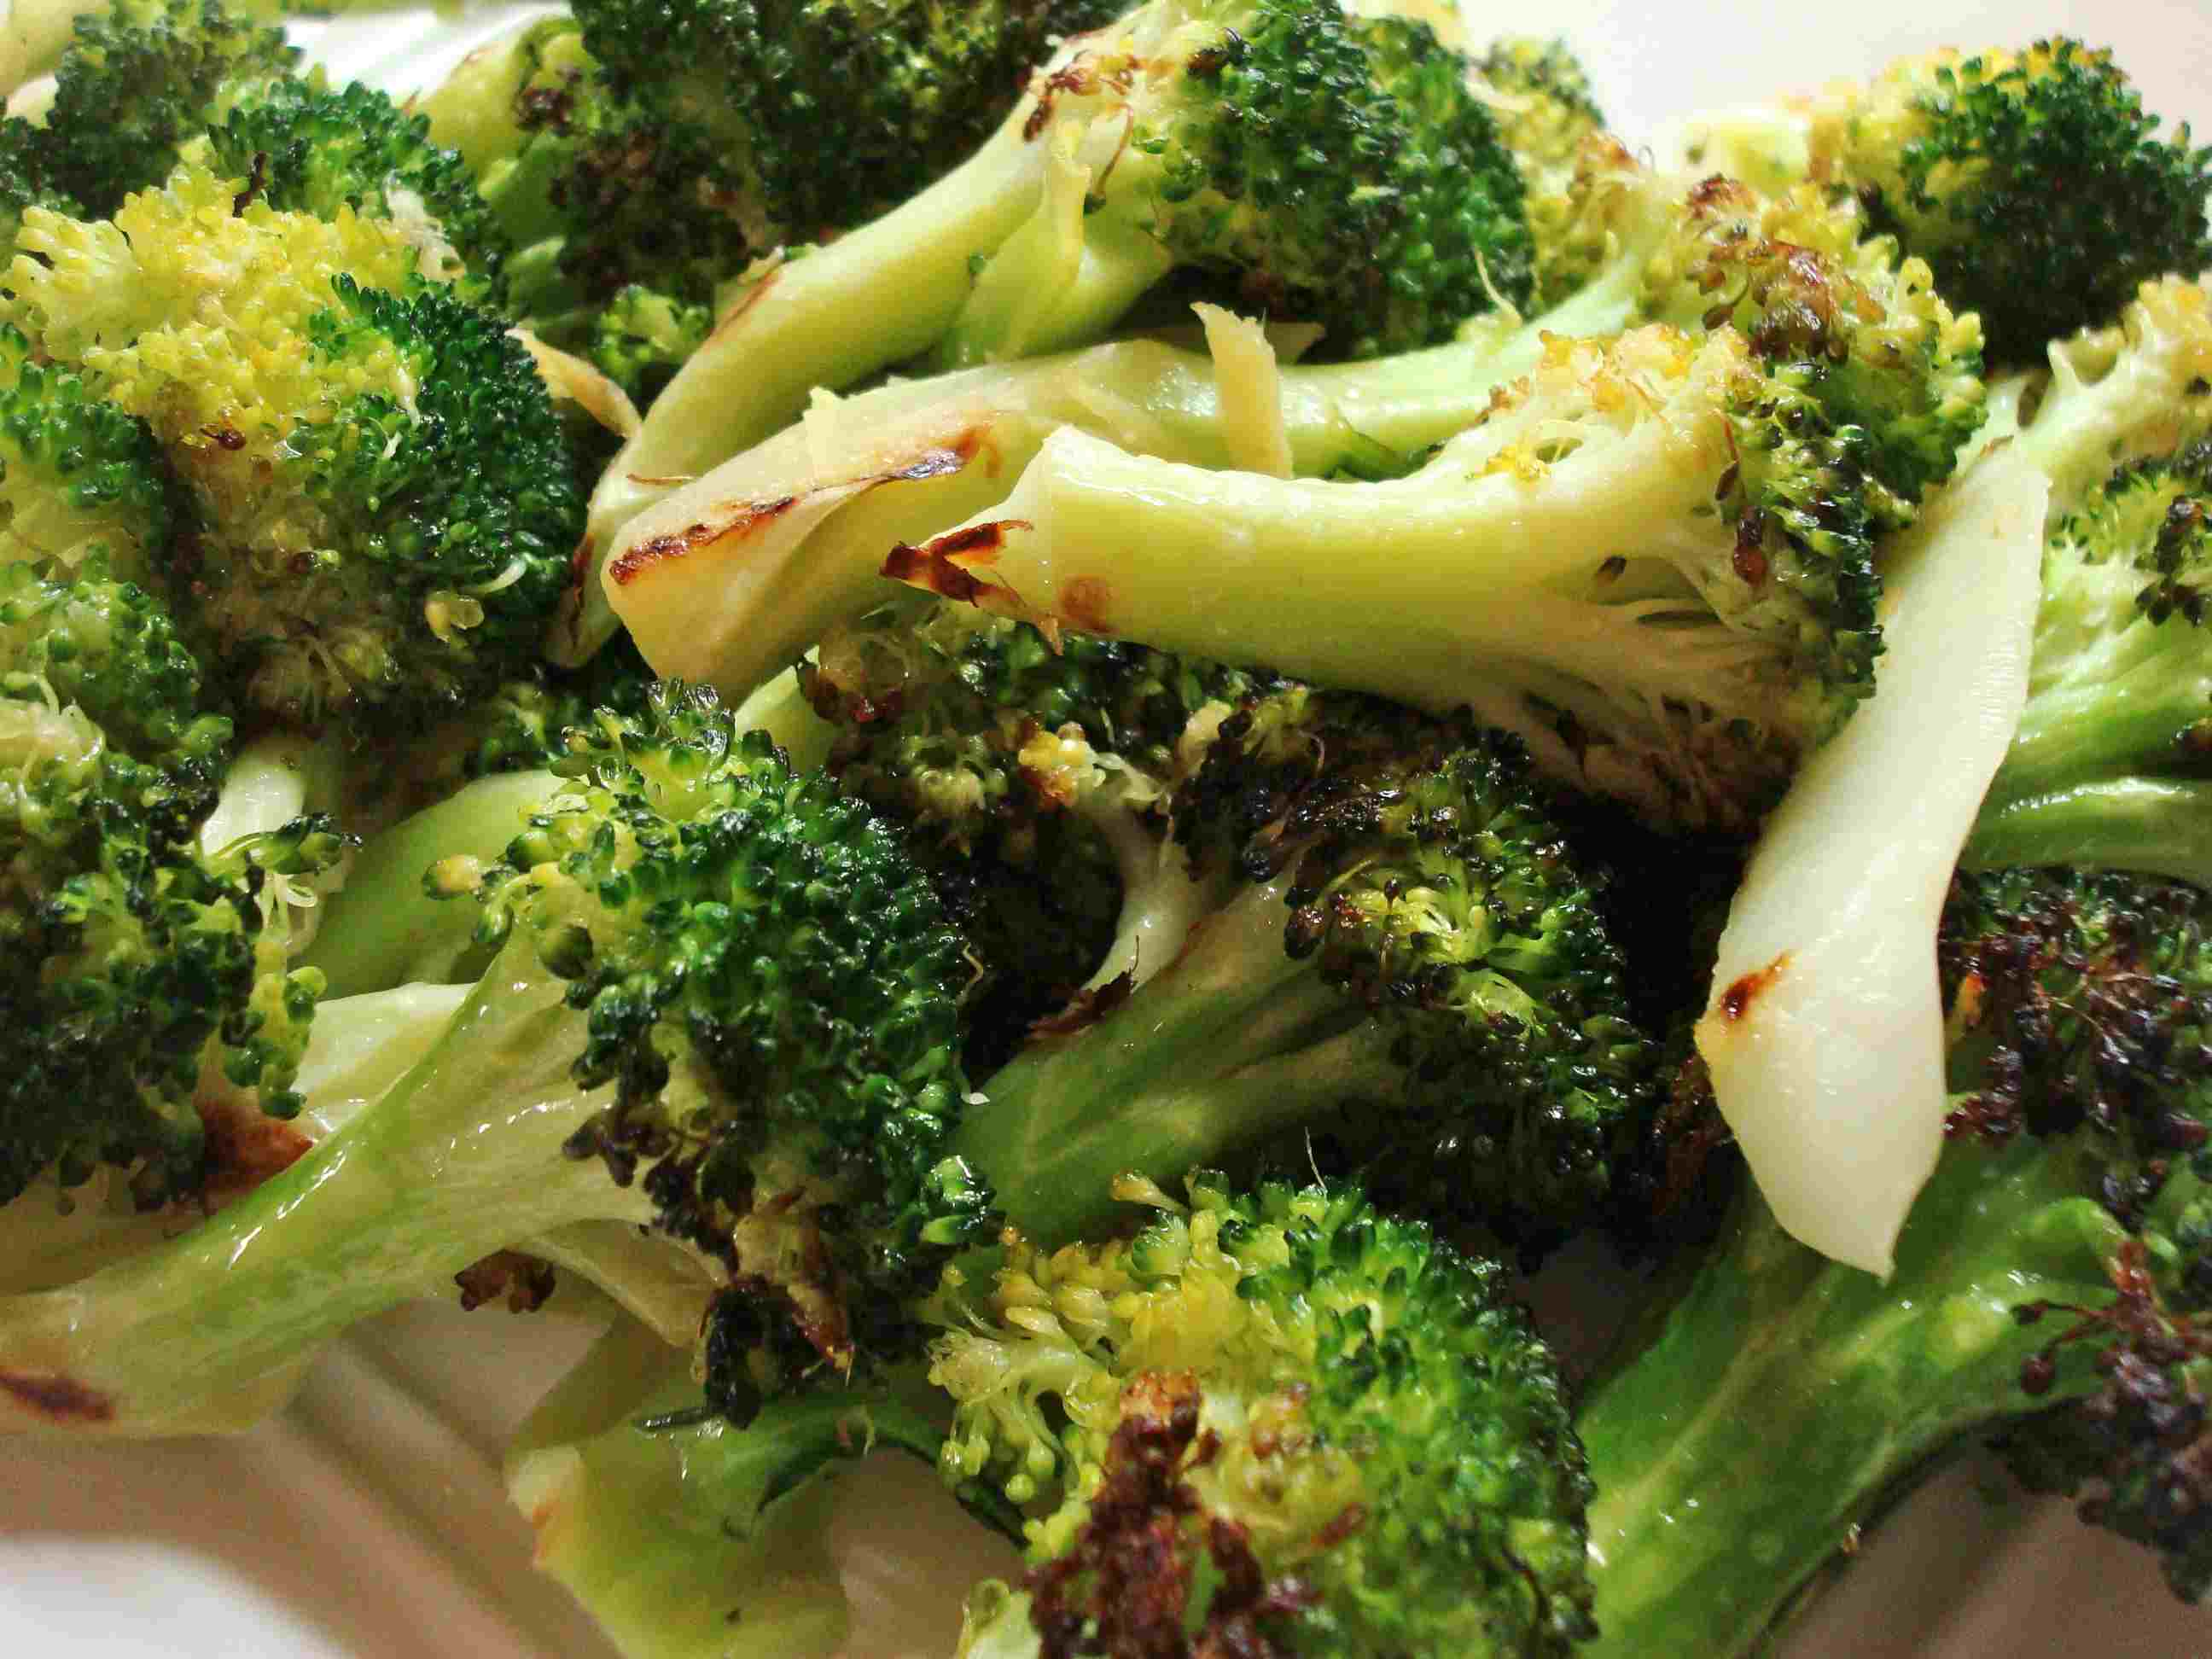 Ginger Roasted Broccoli